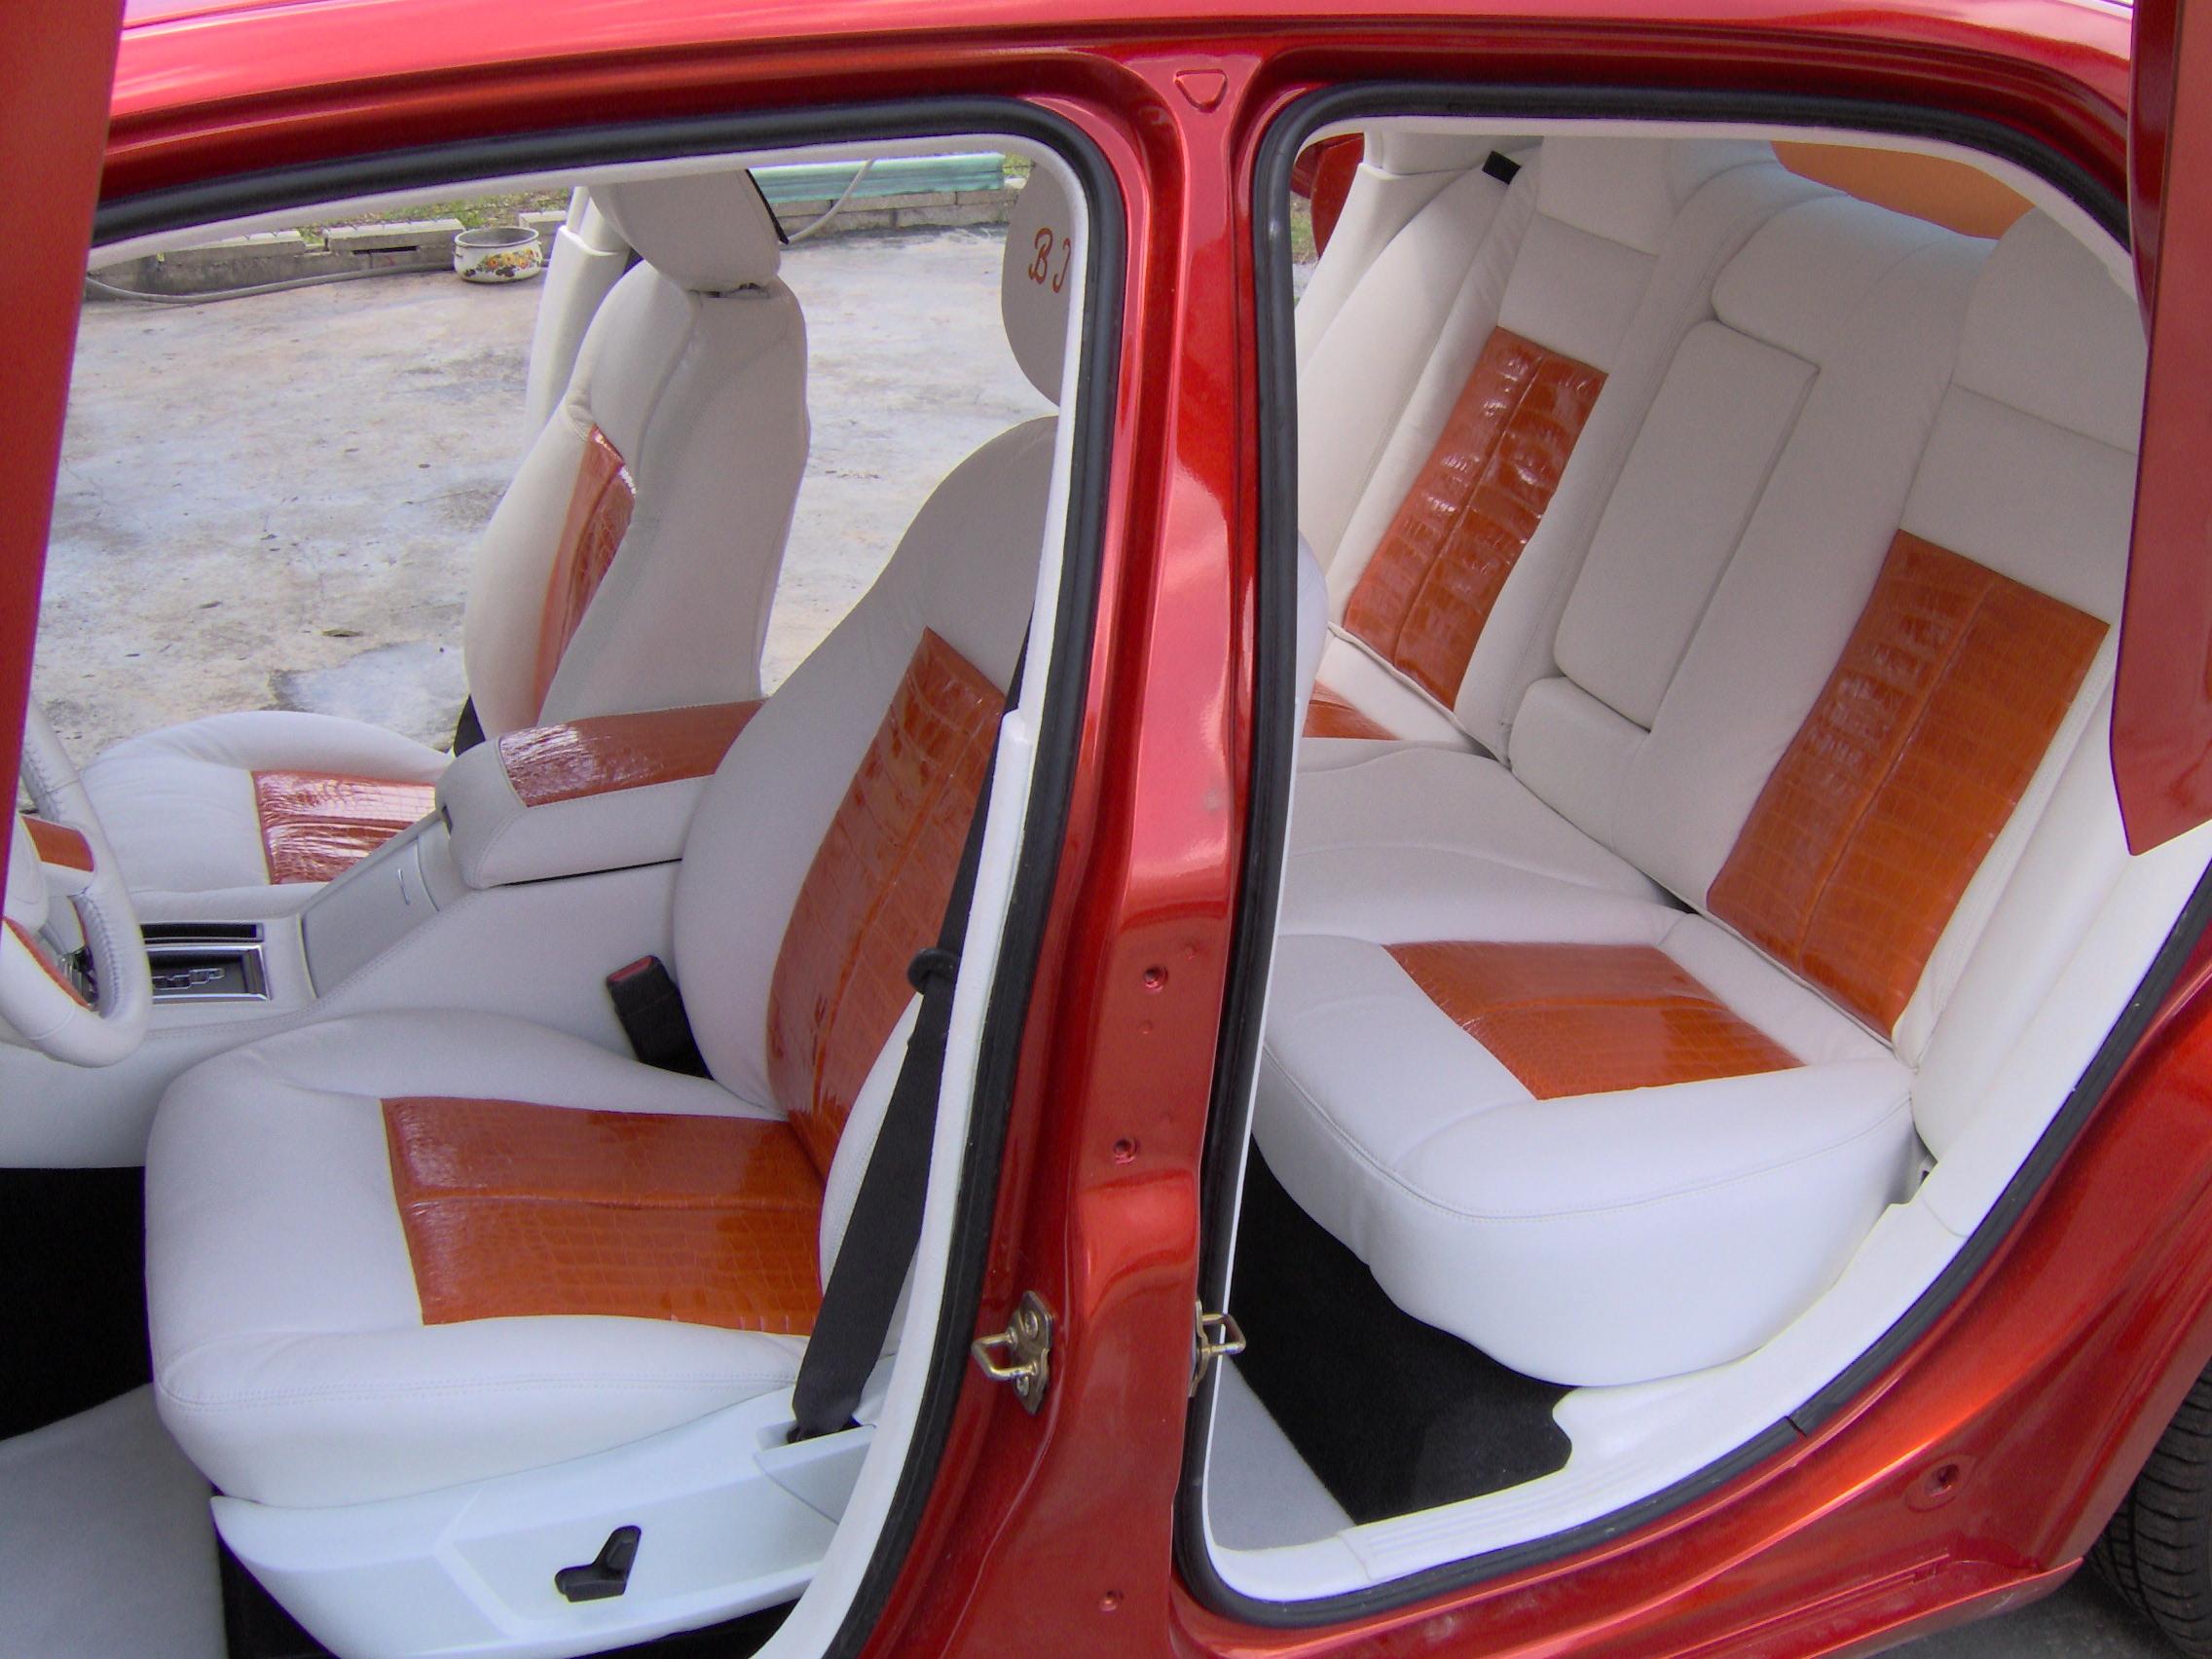 wellfit international company llc car upholstery. Black Bedroom Furniture Sets. Home Design Ideas